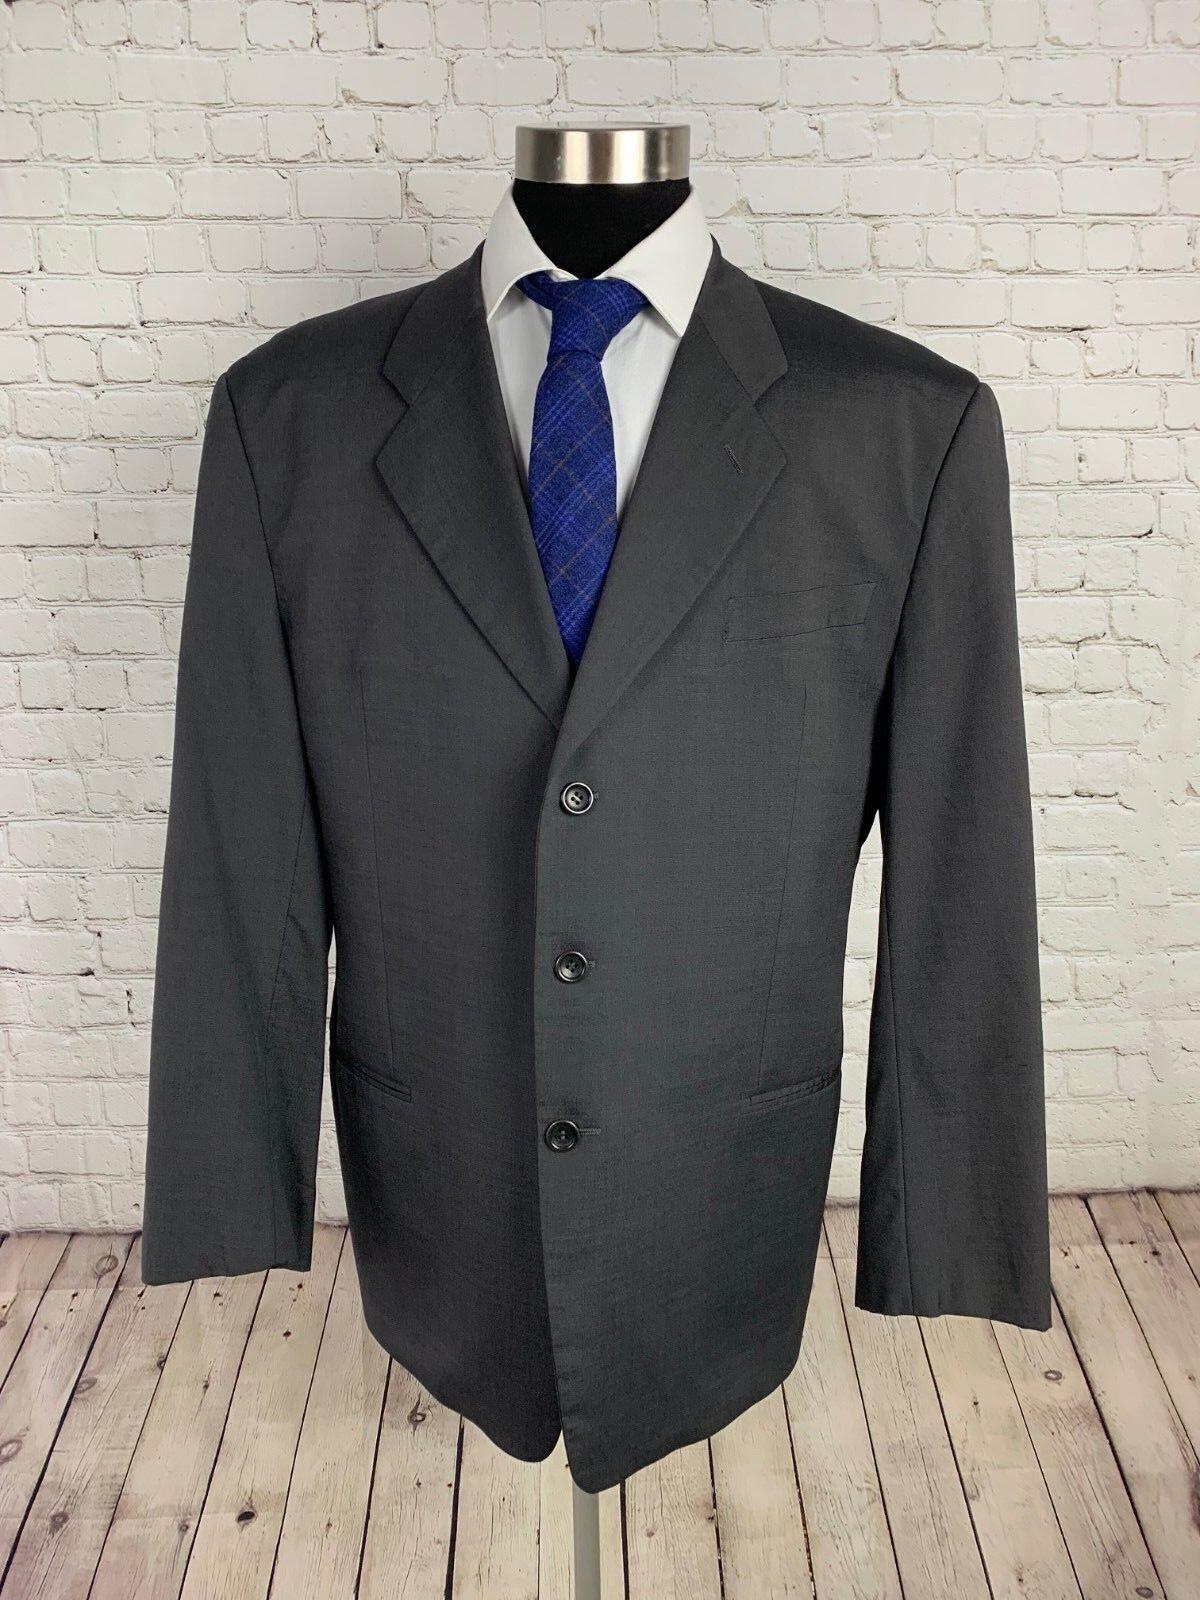 Mint  Giorgio Armani Collezioni  Herren grau Silk & Wool 2pc Suit Größe 46R 36Wx30L